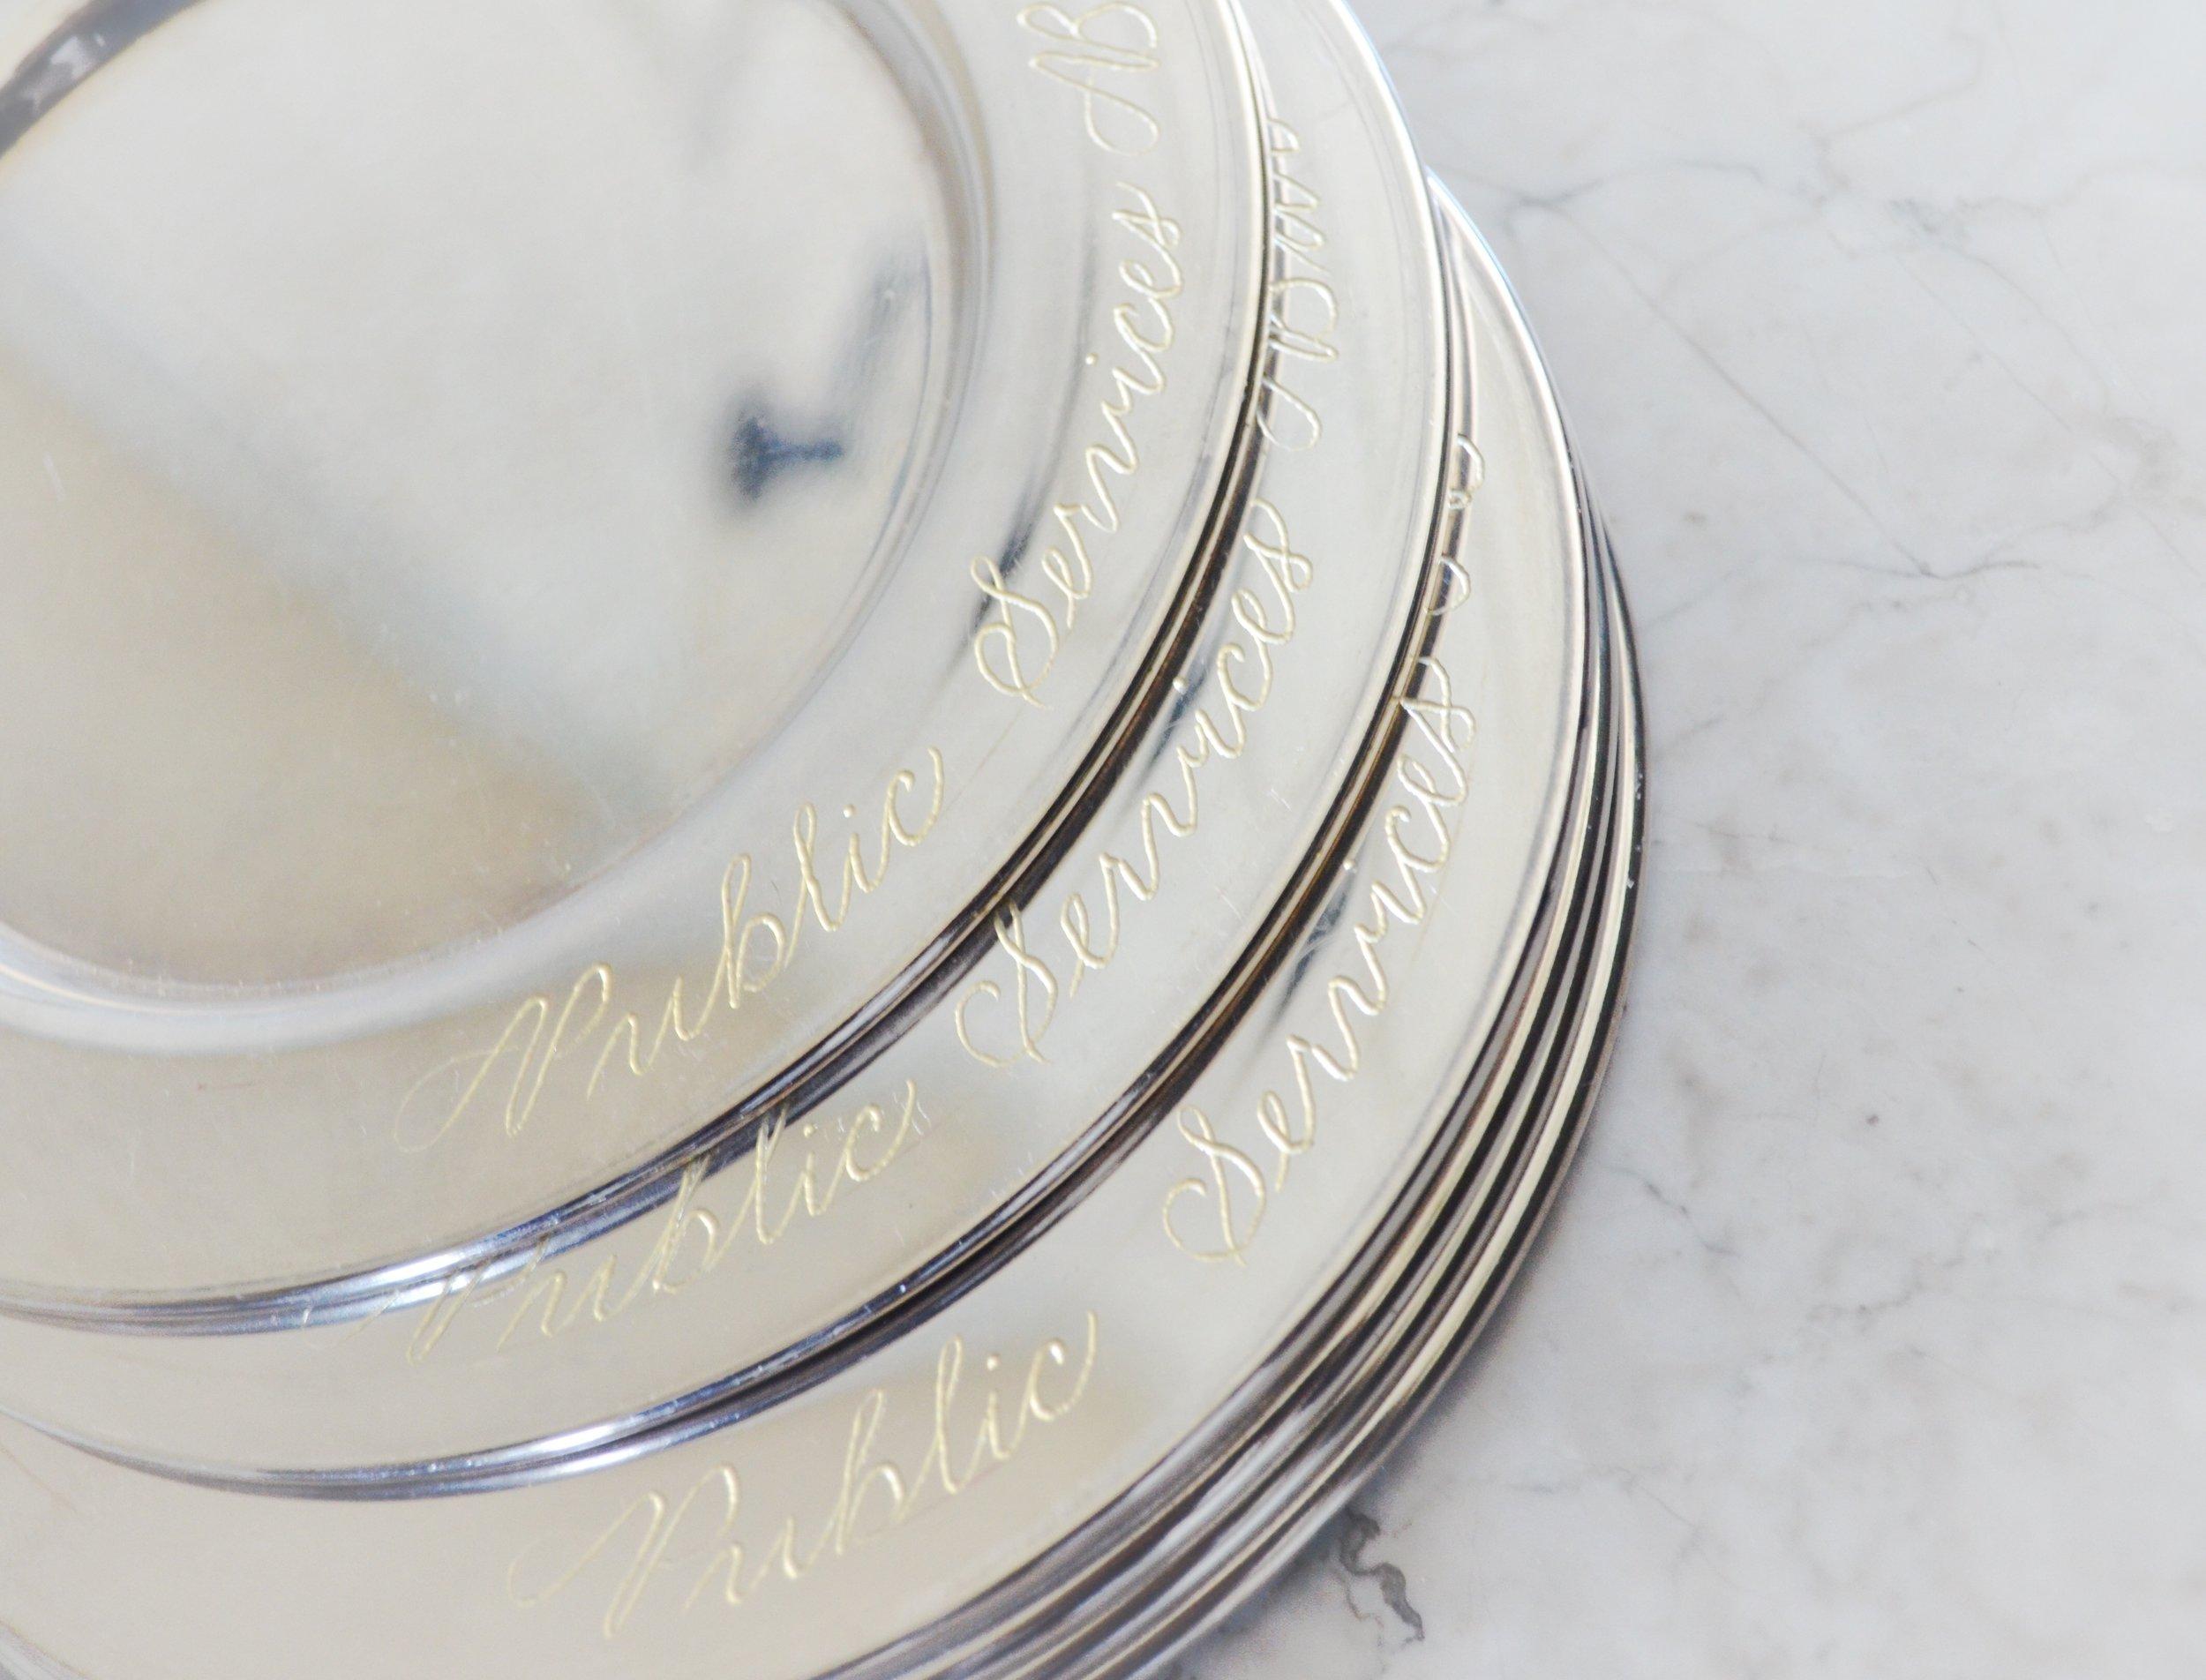 Jewelry Engraving Houston - Slinging Ink